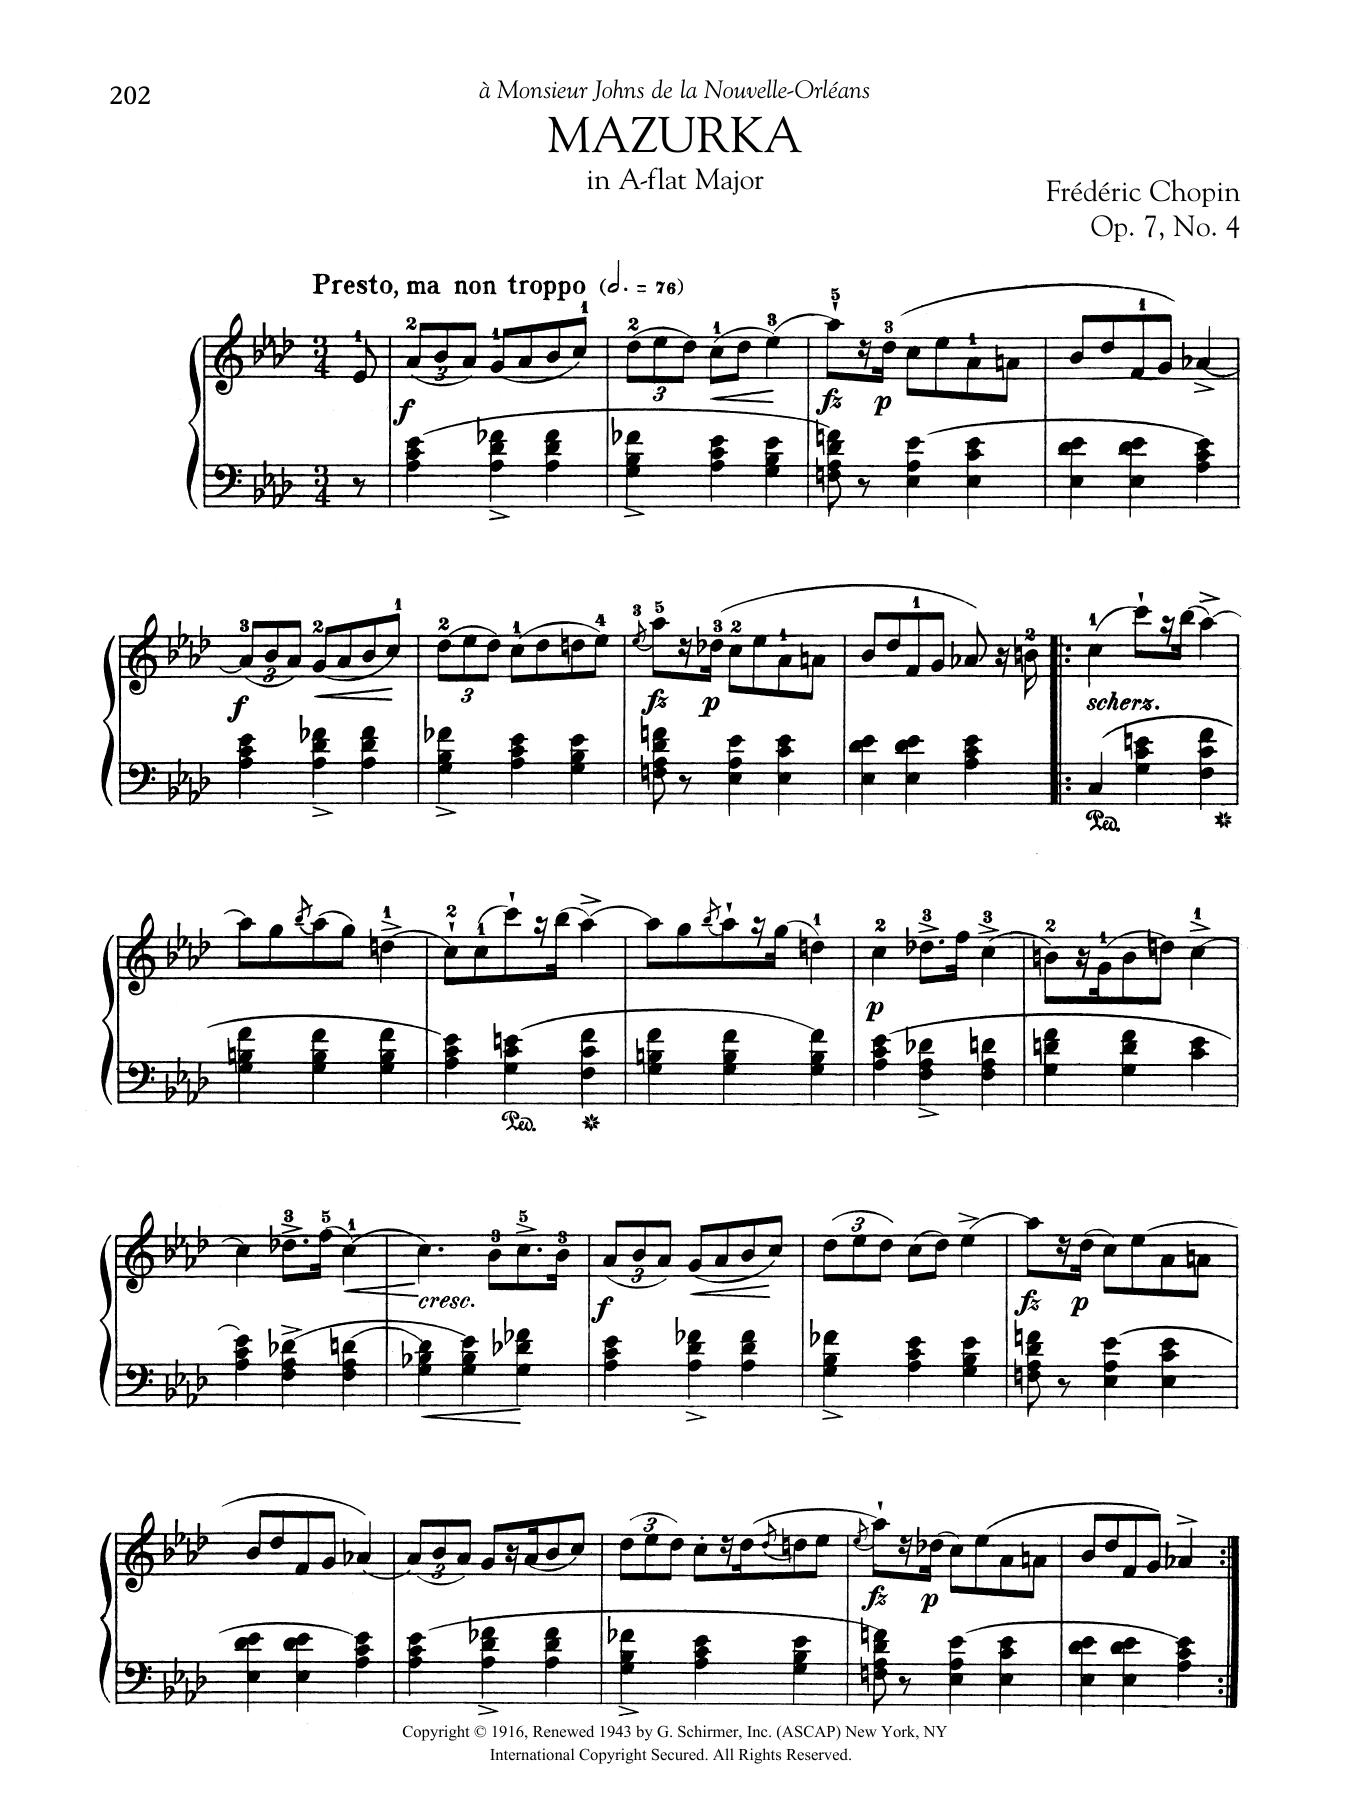 Mazurka in A-flat Major, Op. 7, No. 4 Sheet Music